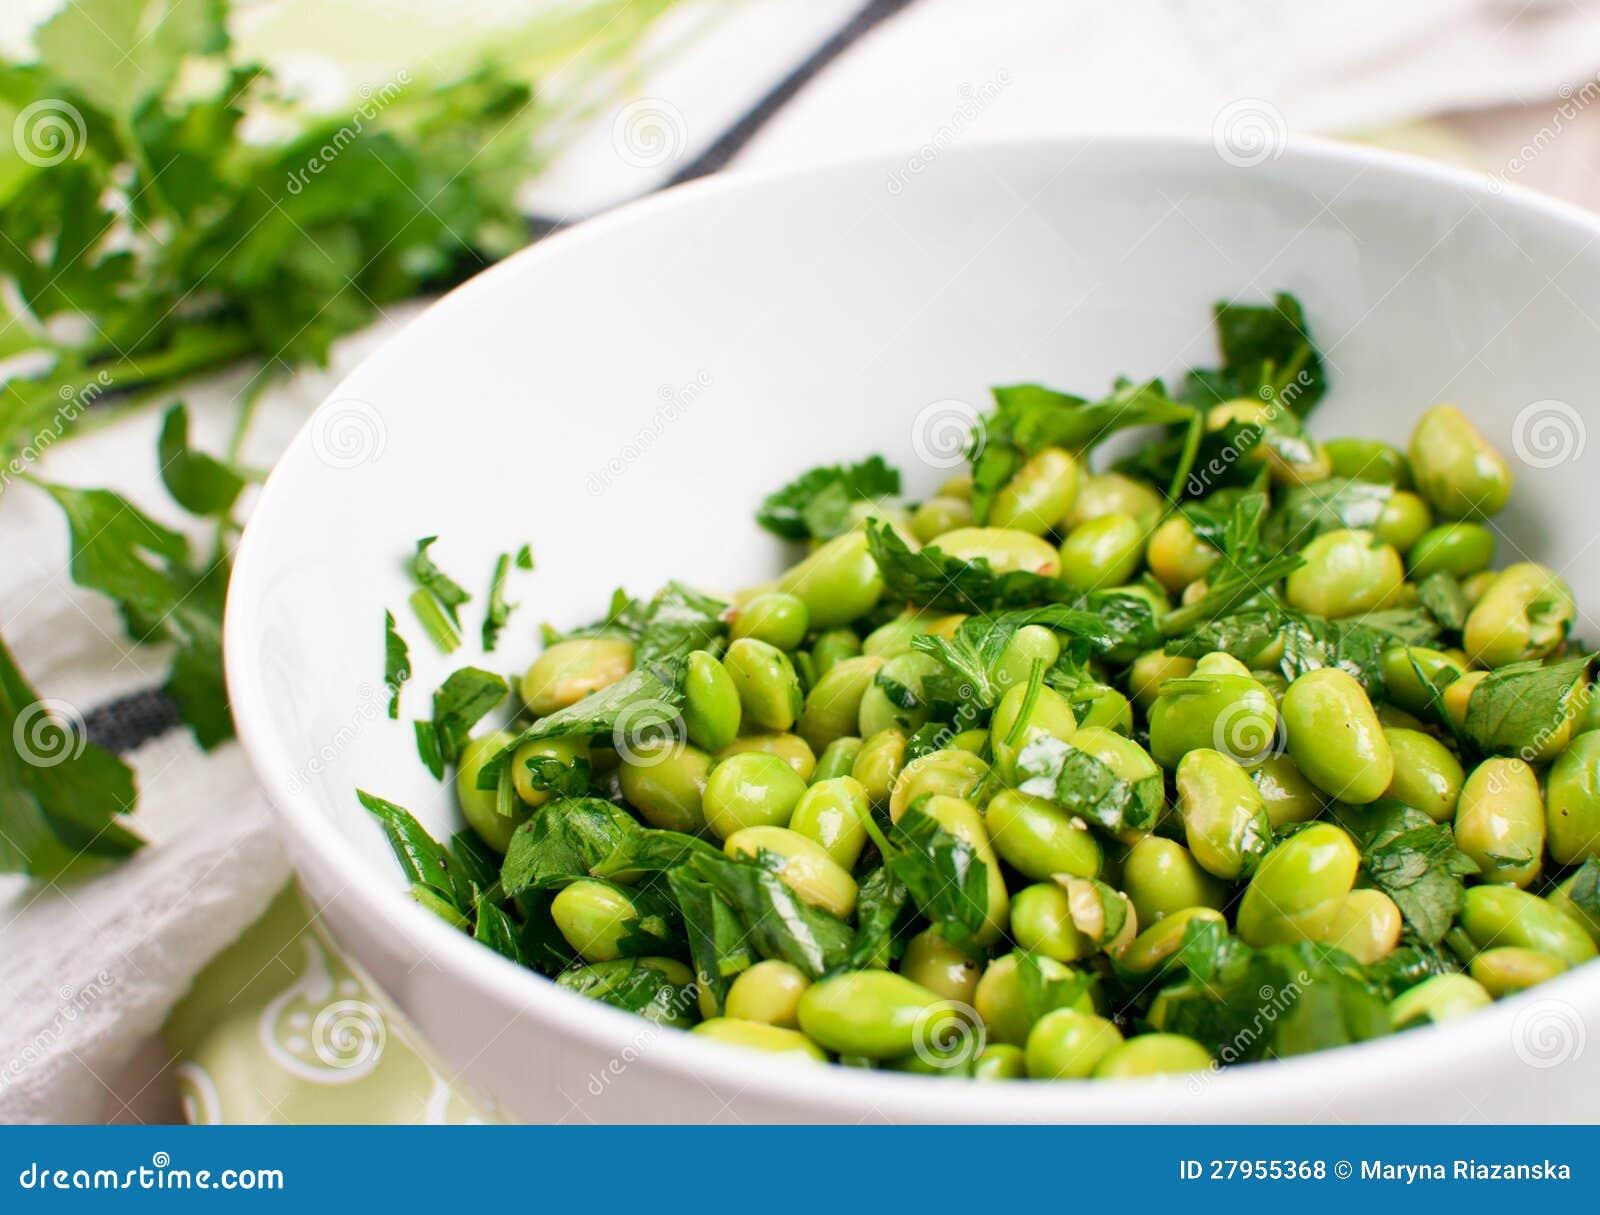 salade d 39 haricots de soja d 39 edamame avec le persil photo stock image du closeup nourriture. Black Bedroom Furniture Sets. Home Design Ideas